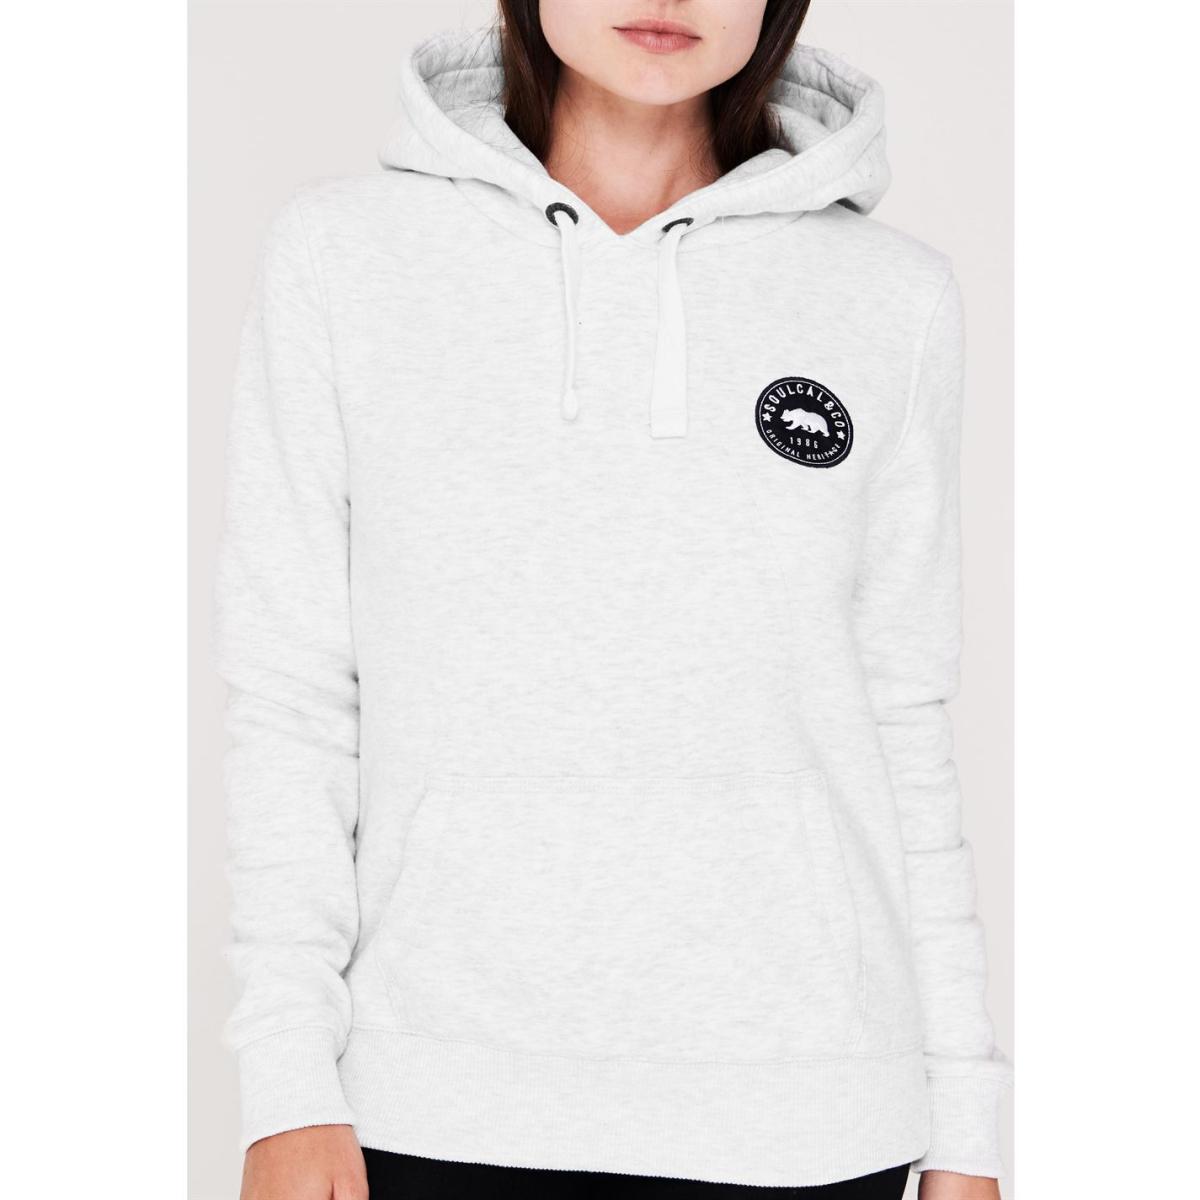 SoulCal Kapuzenjacke Jacke Kapuzenpullover Damen Sweatshirt Pullover 9001